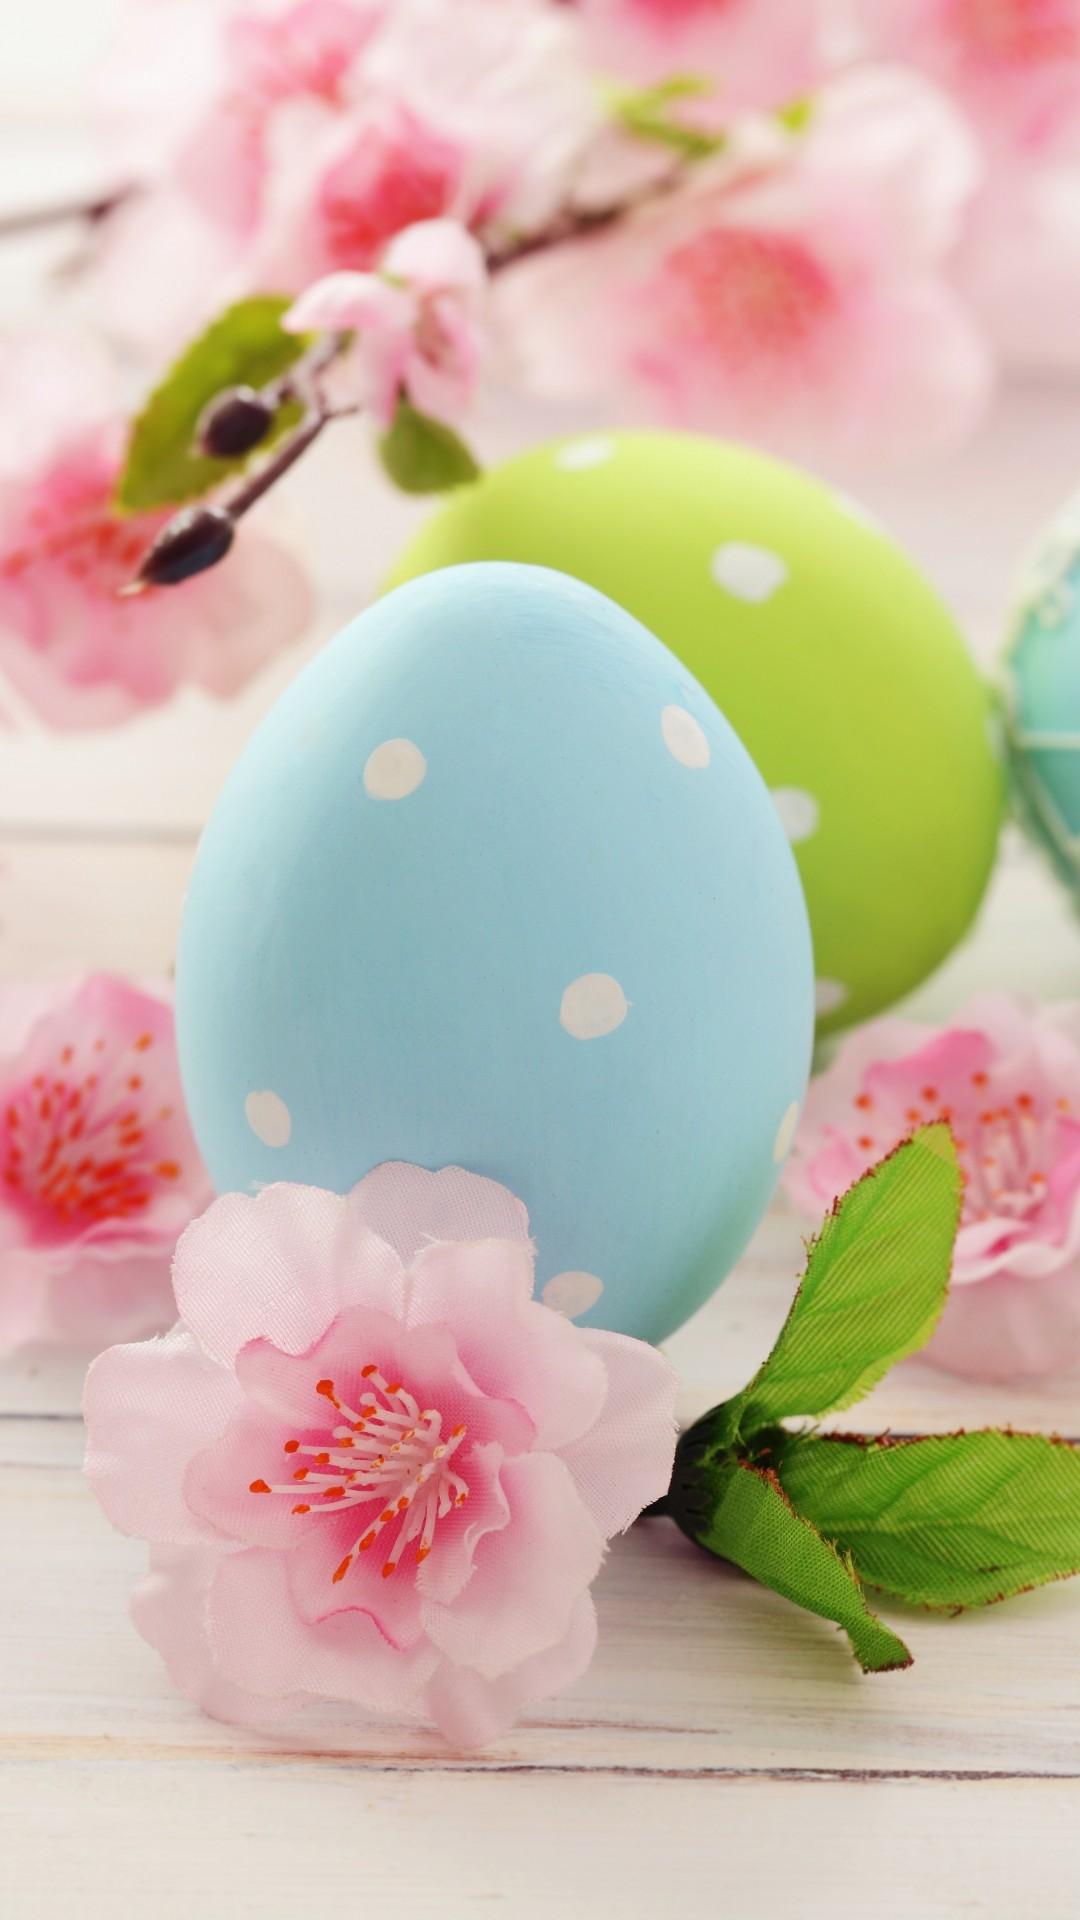 Wallpaper Easter Eggs Branch Flowers Holidays 4449